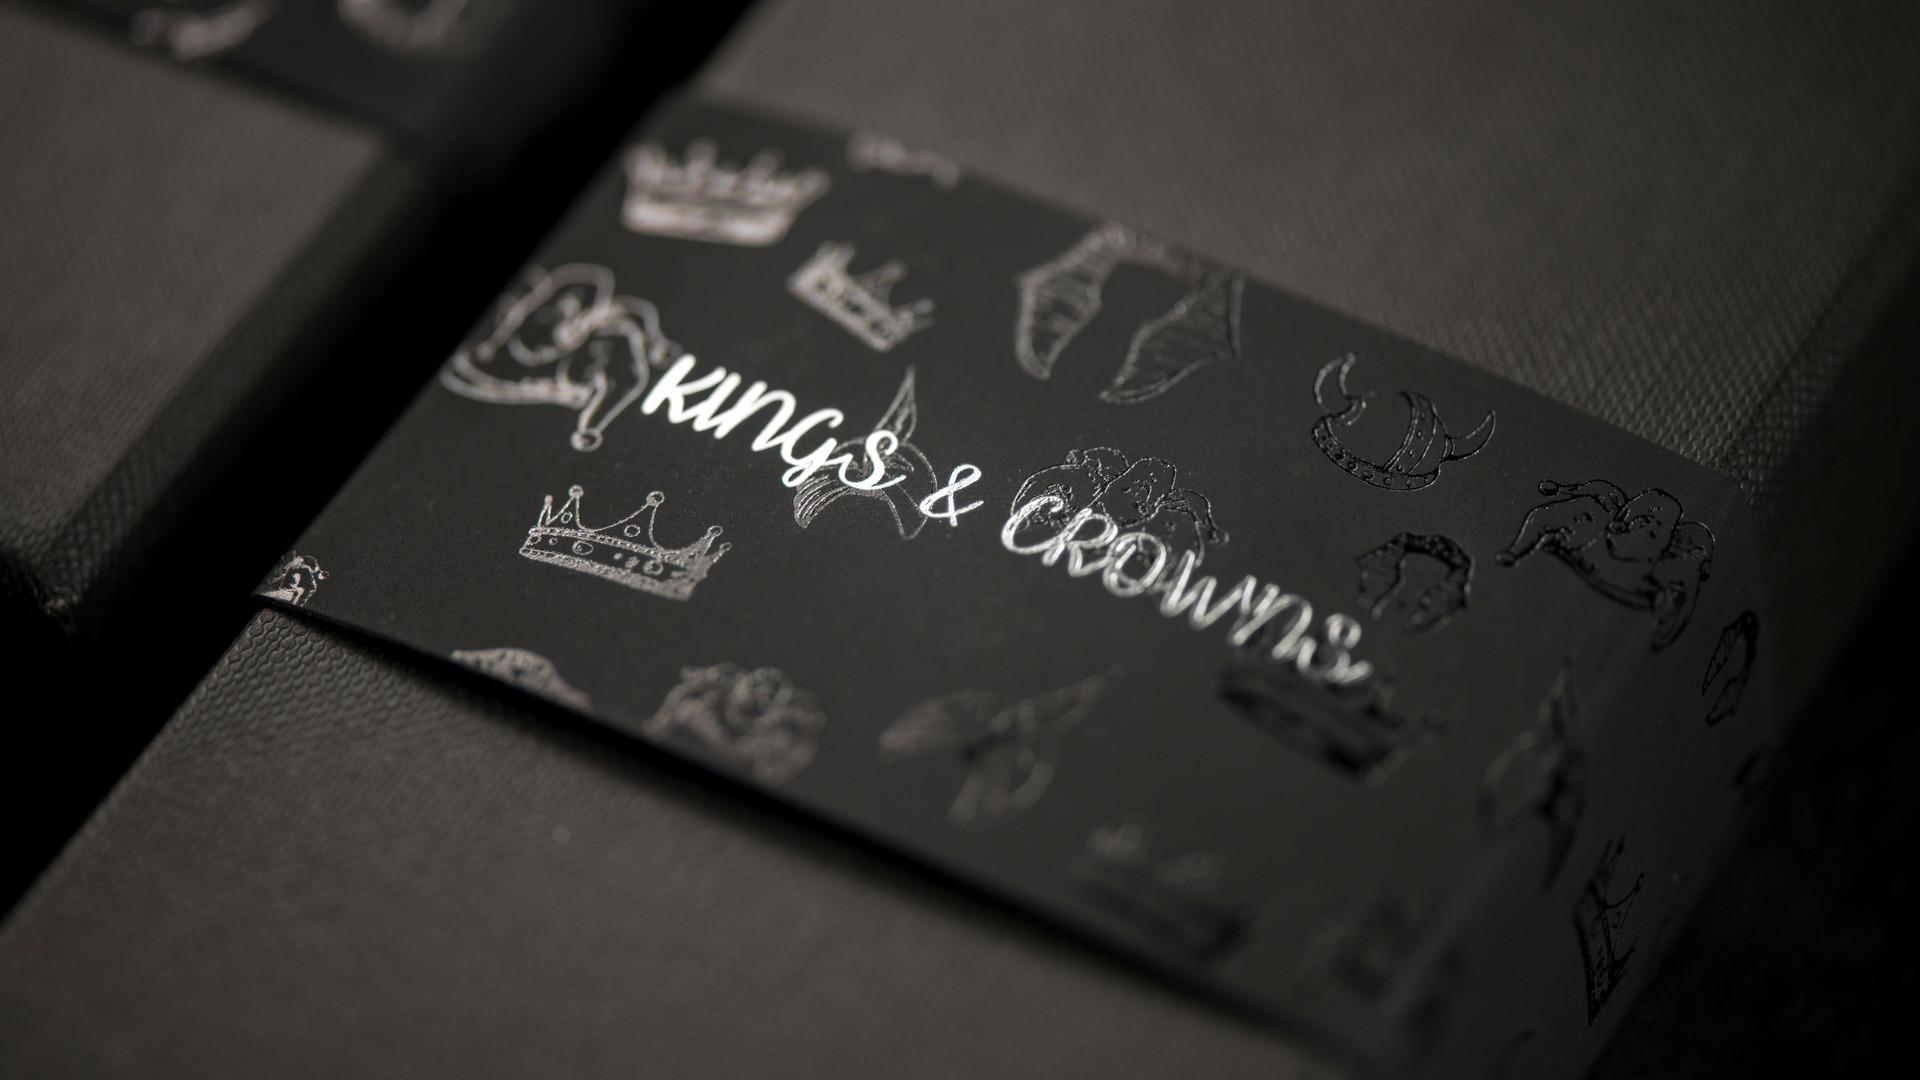 Huwa Kings & crowns